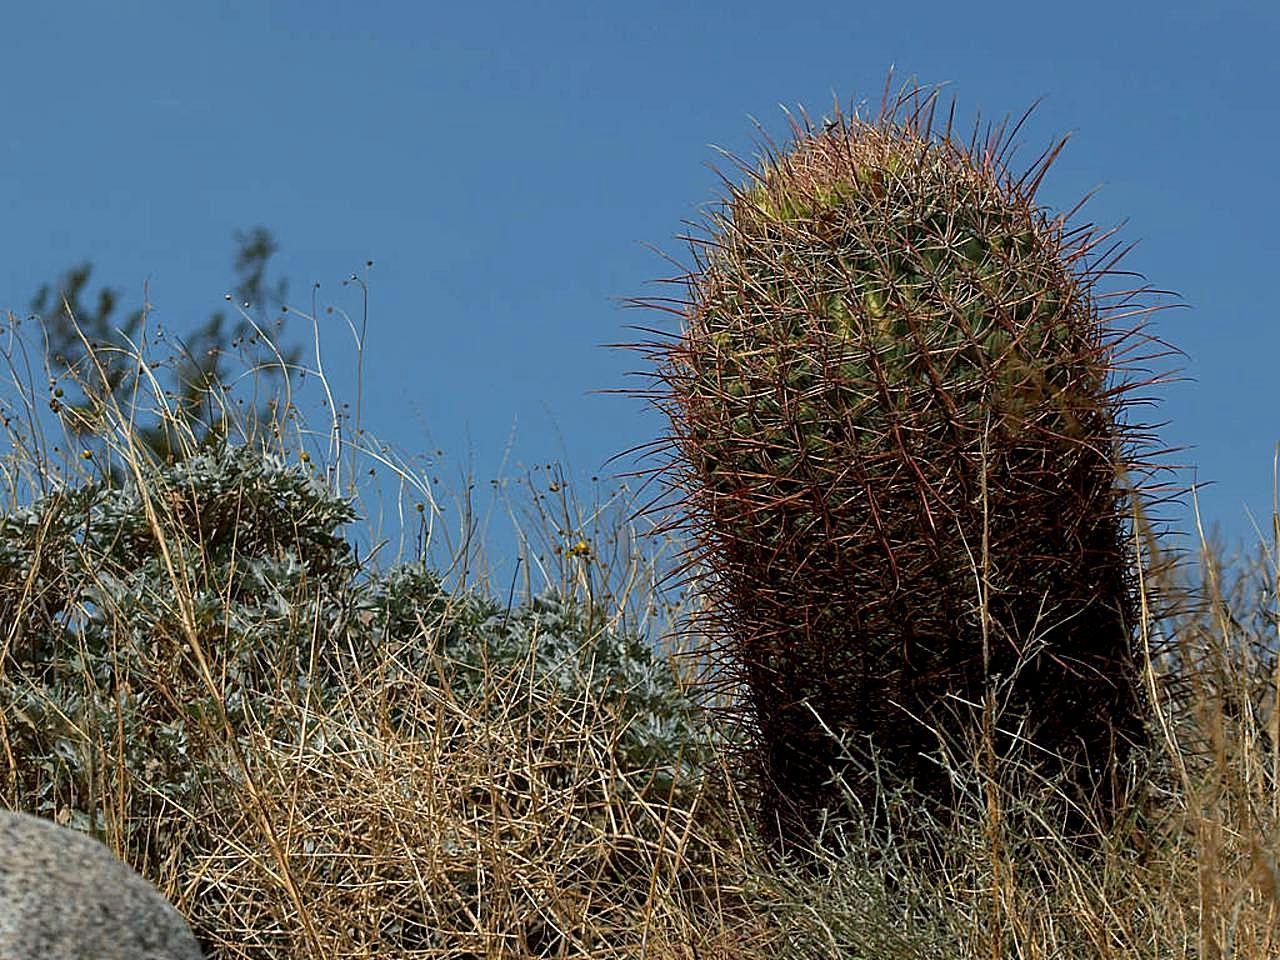 File:Barrel cactus a cactus in Anza Borrego desert cactus